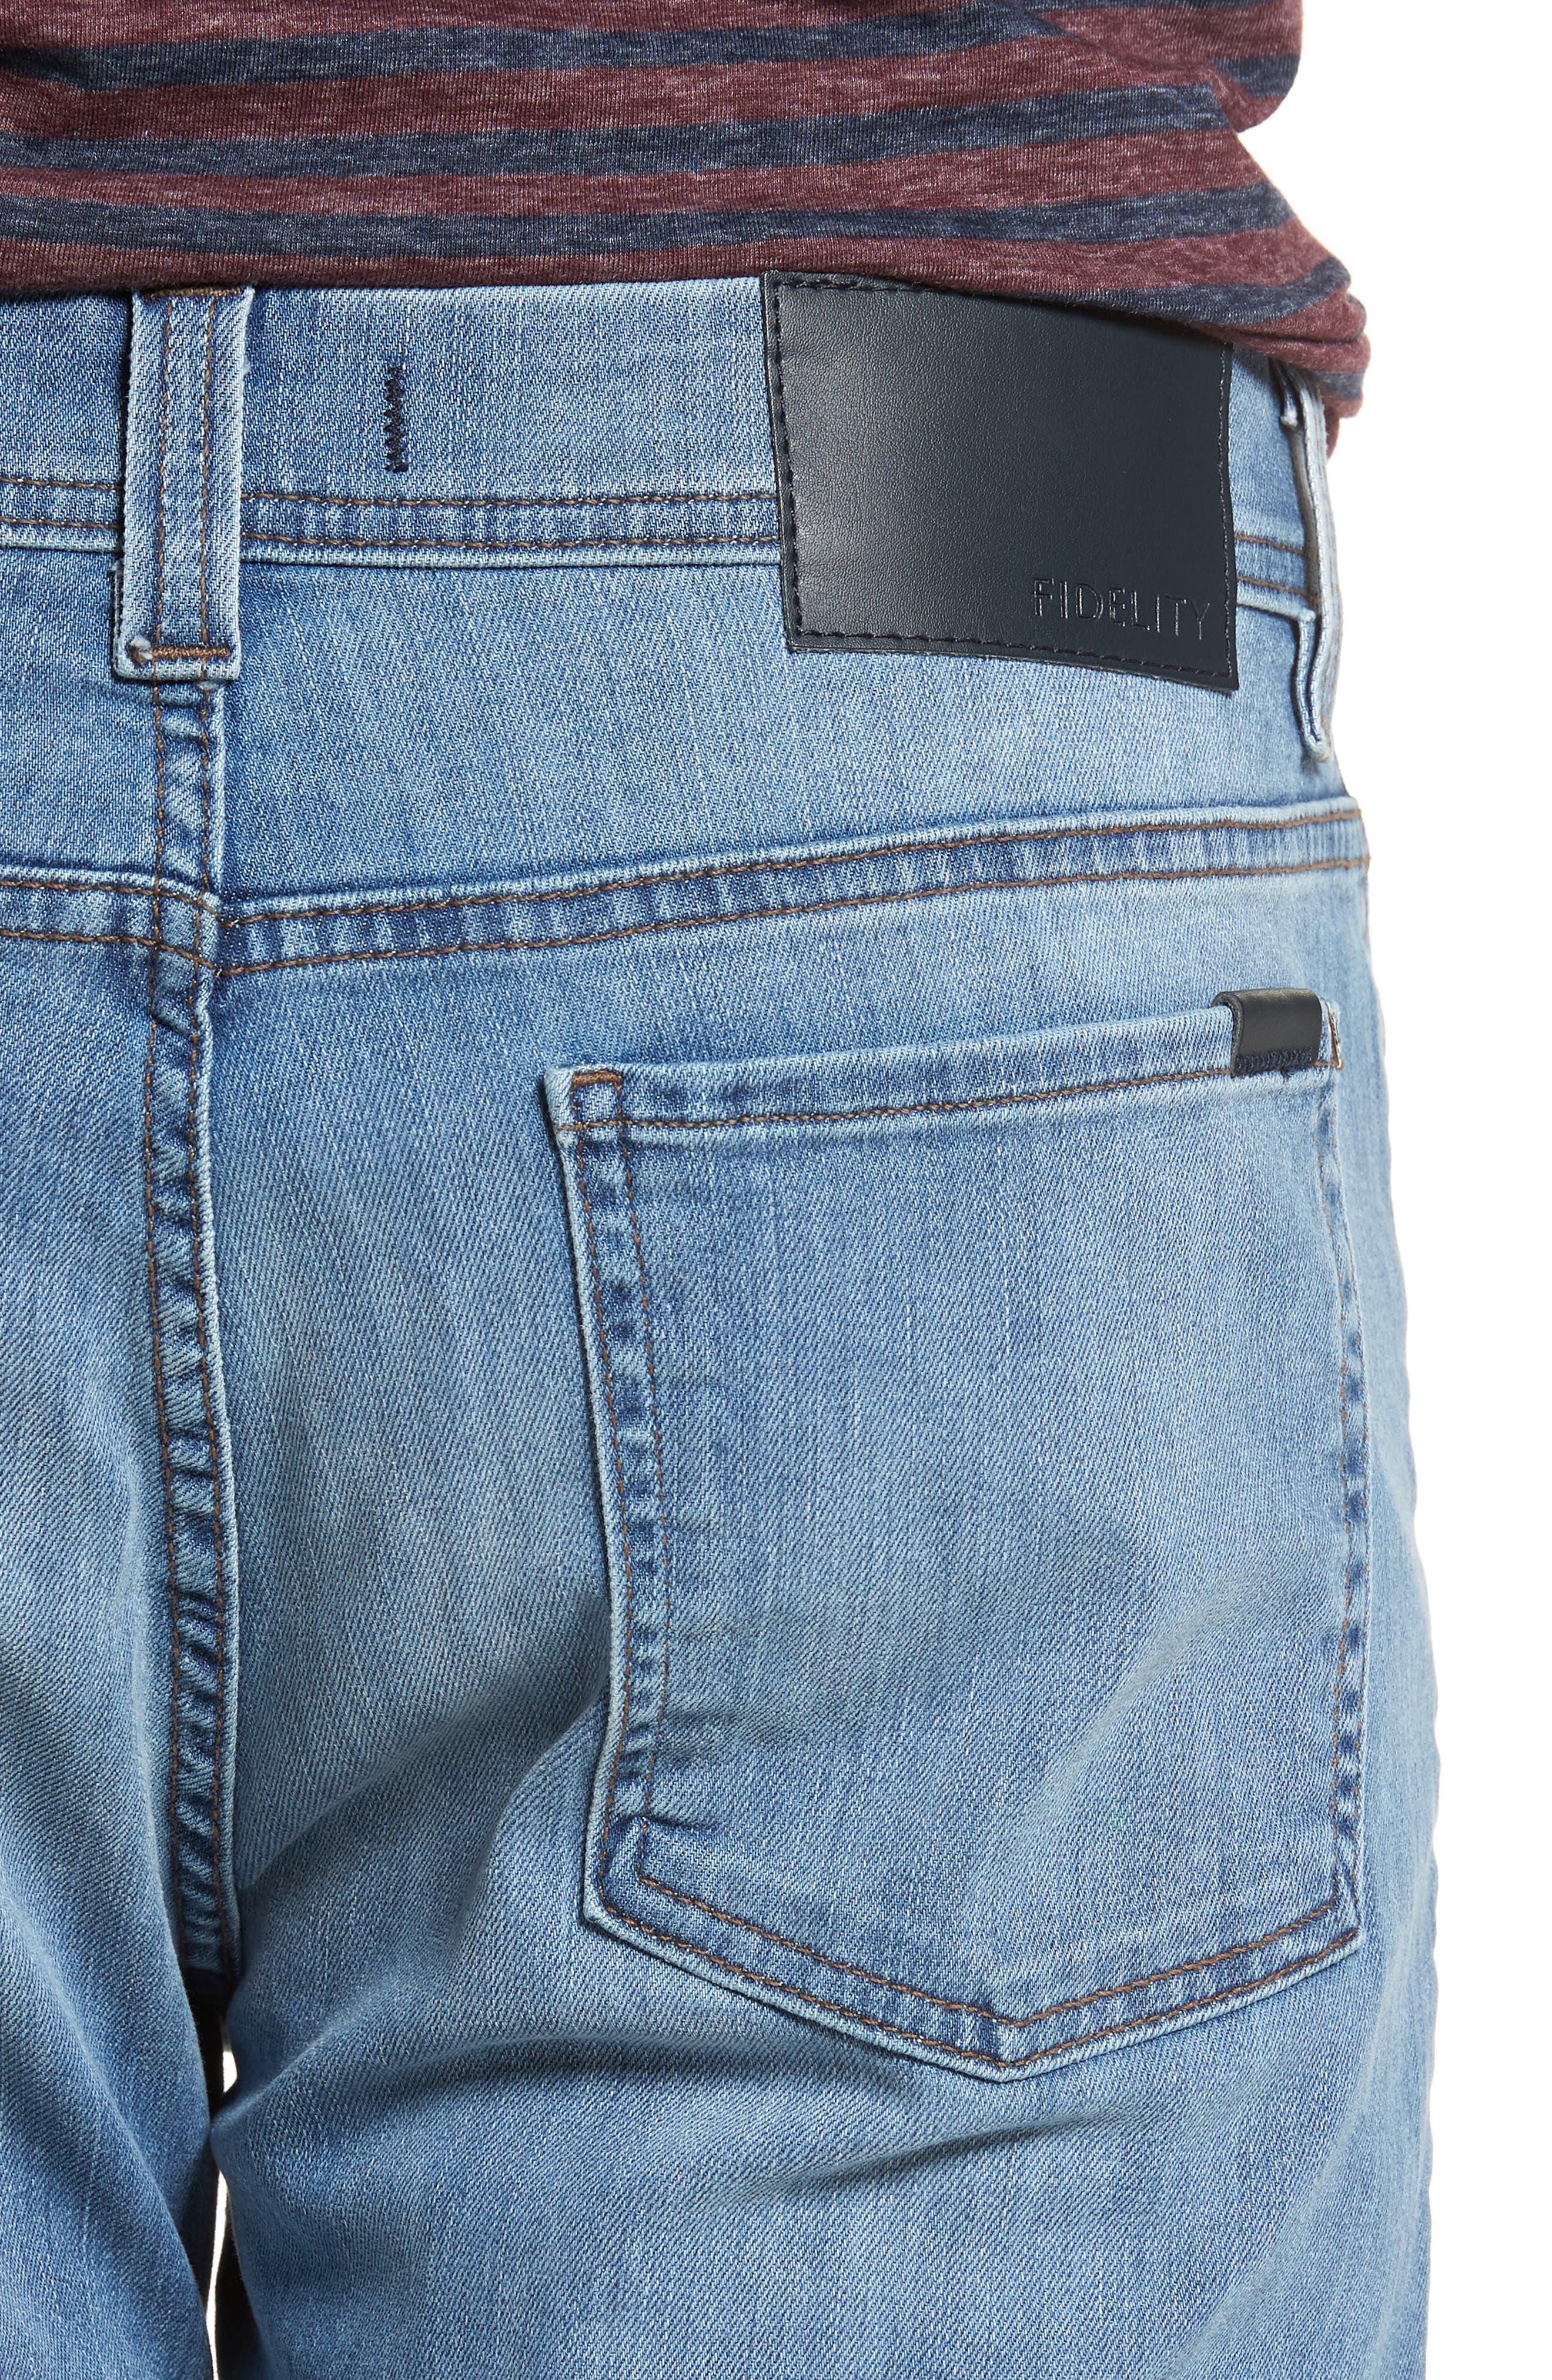 Jimmy Slim Straight Fit Jeans,                             Alternate thumbnail 4, color,                             Brixton Blue